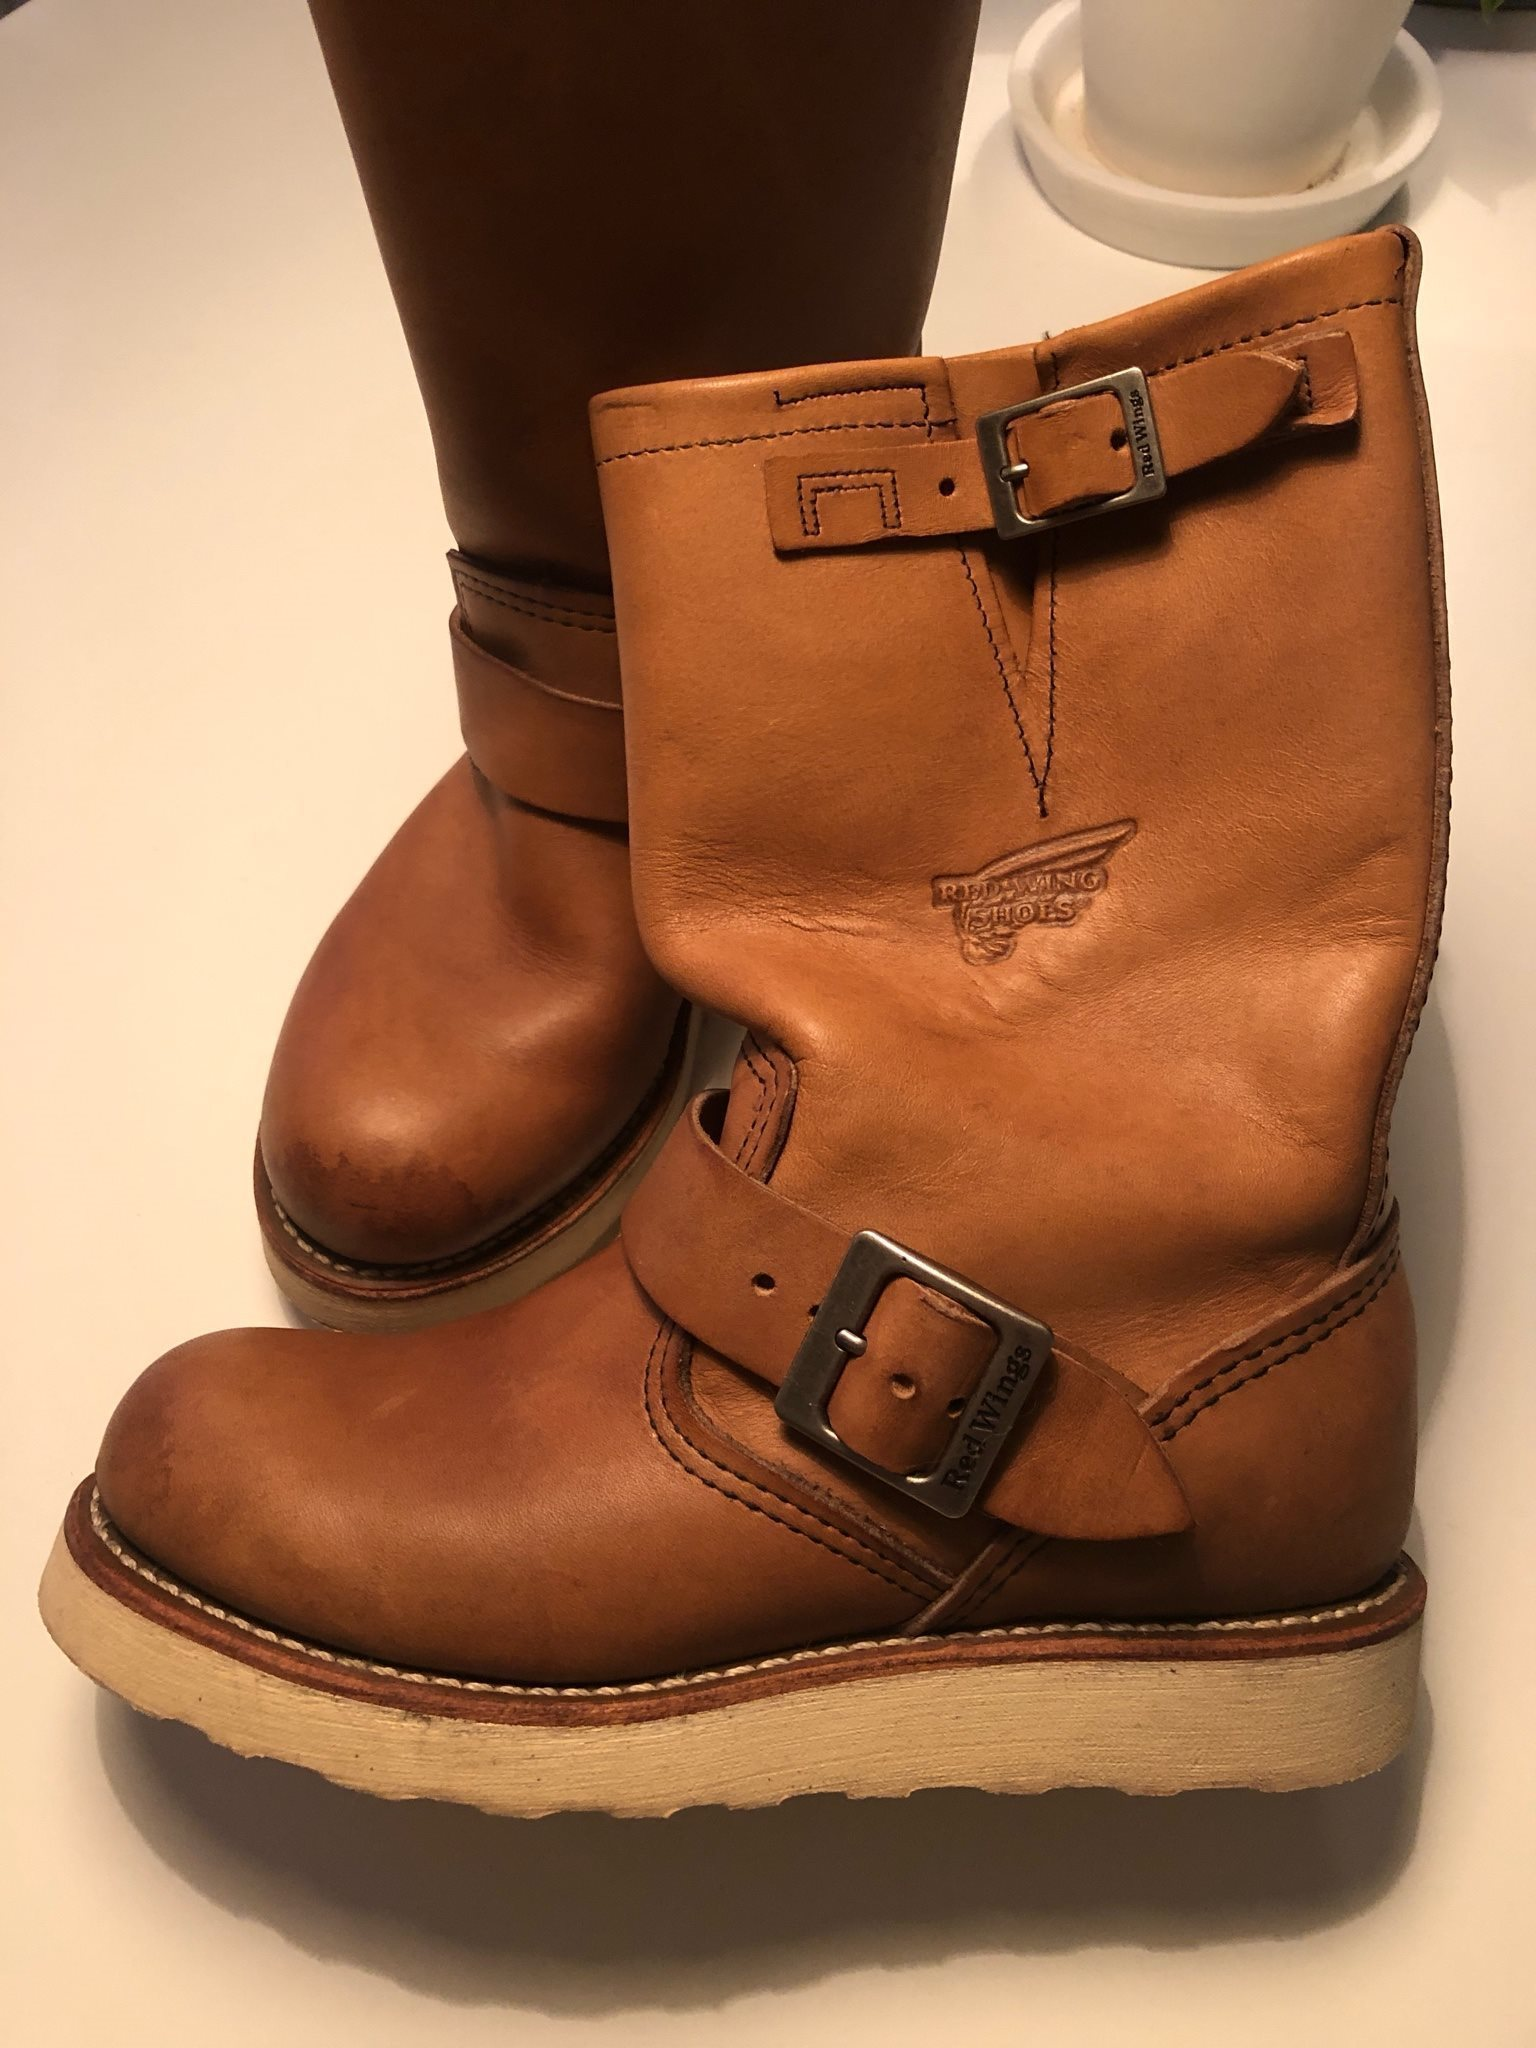 boots stl 35